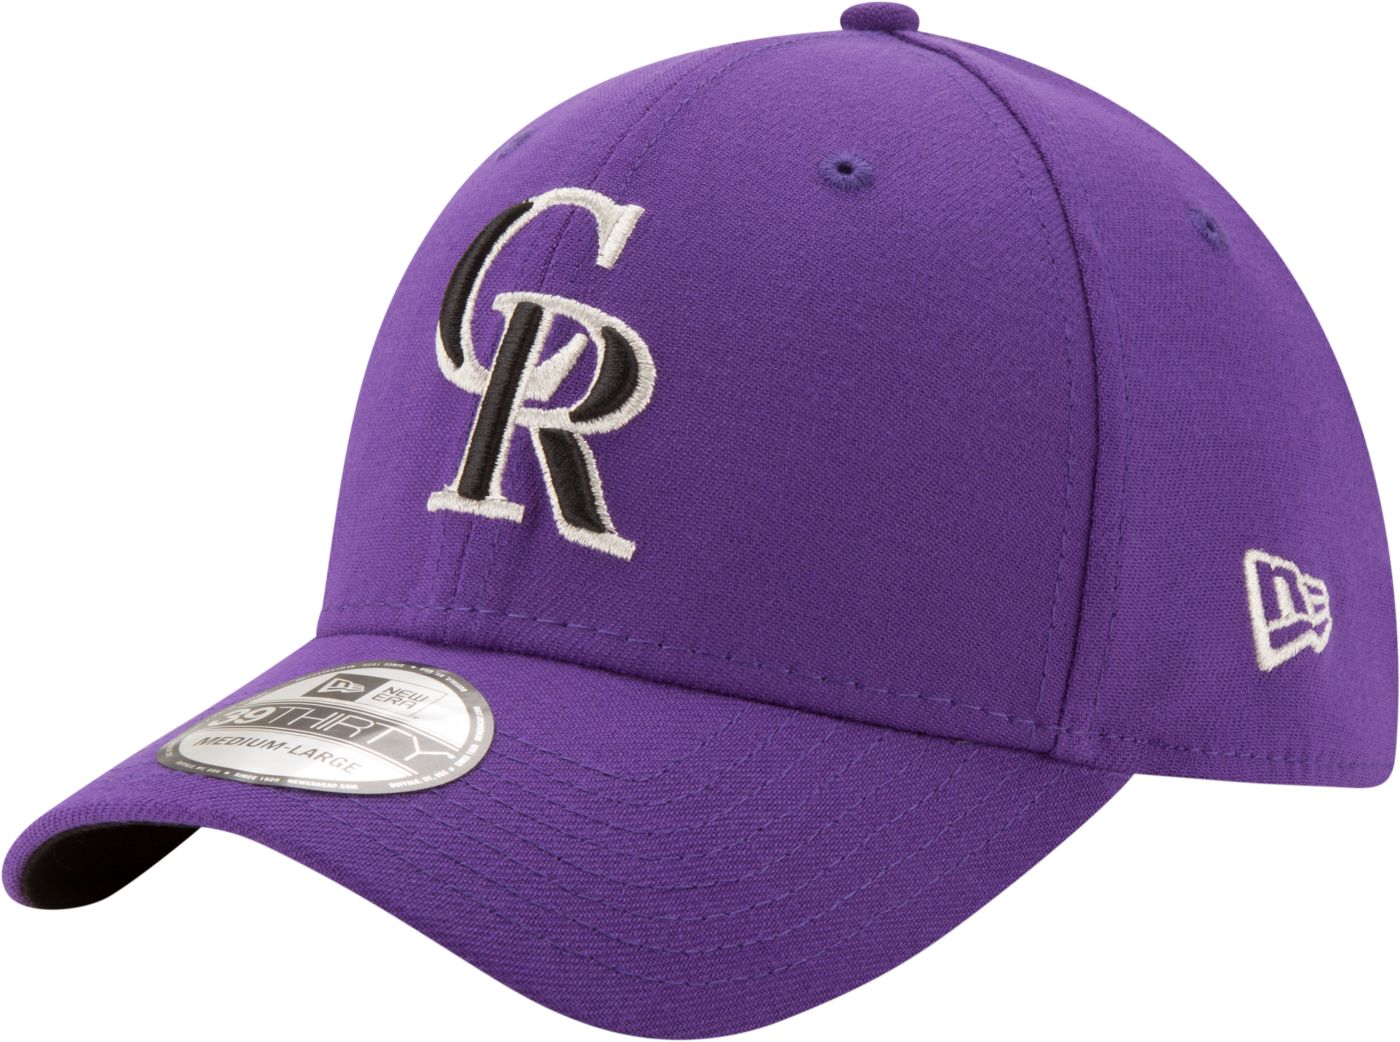 New Era Men's Colorado Rockies 39Thirty Purple Stretch Fit Hat